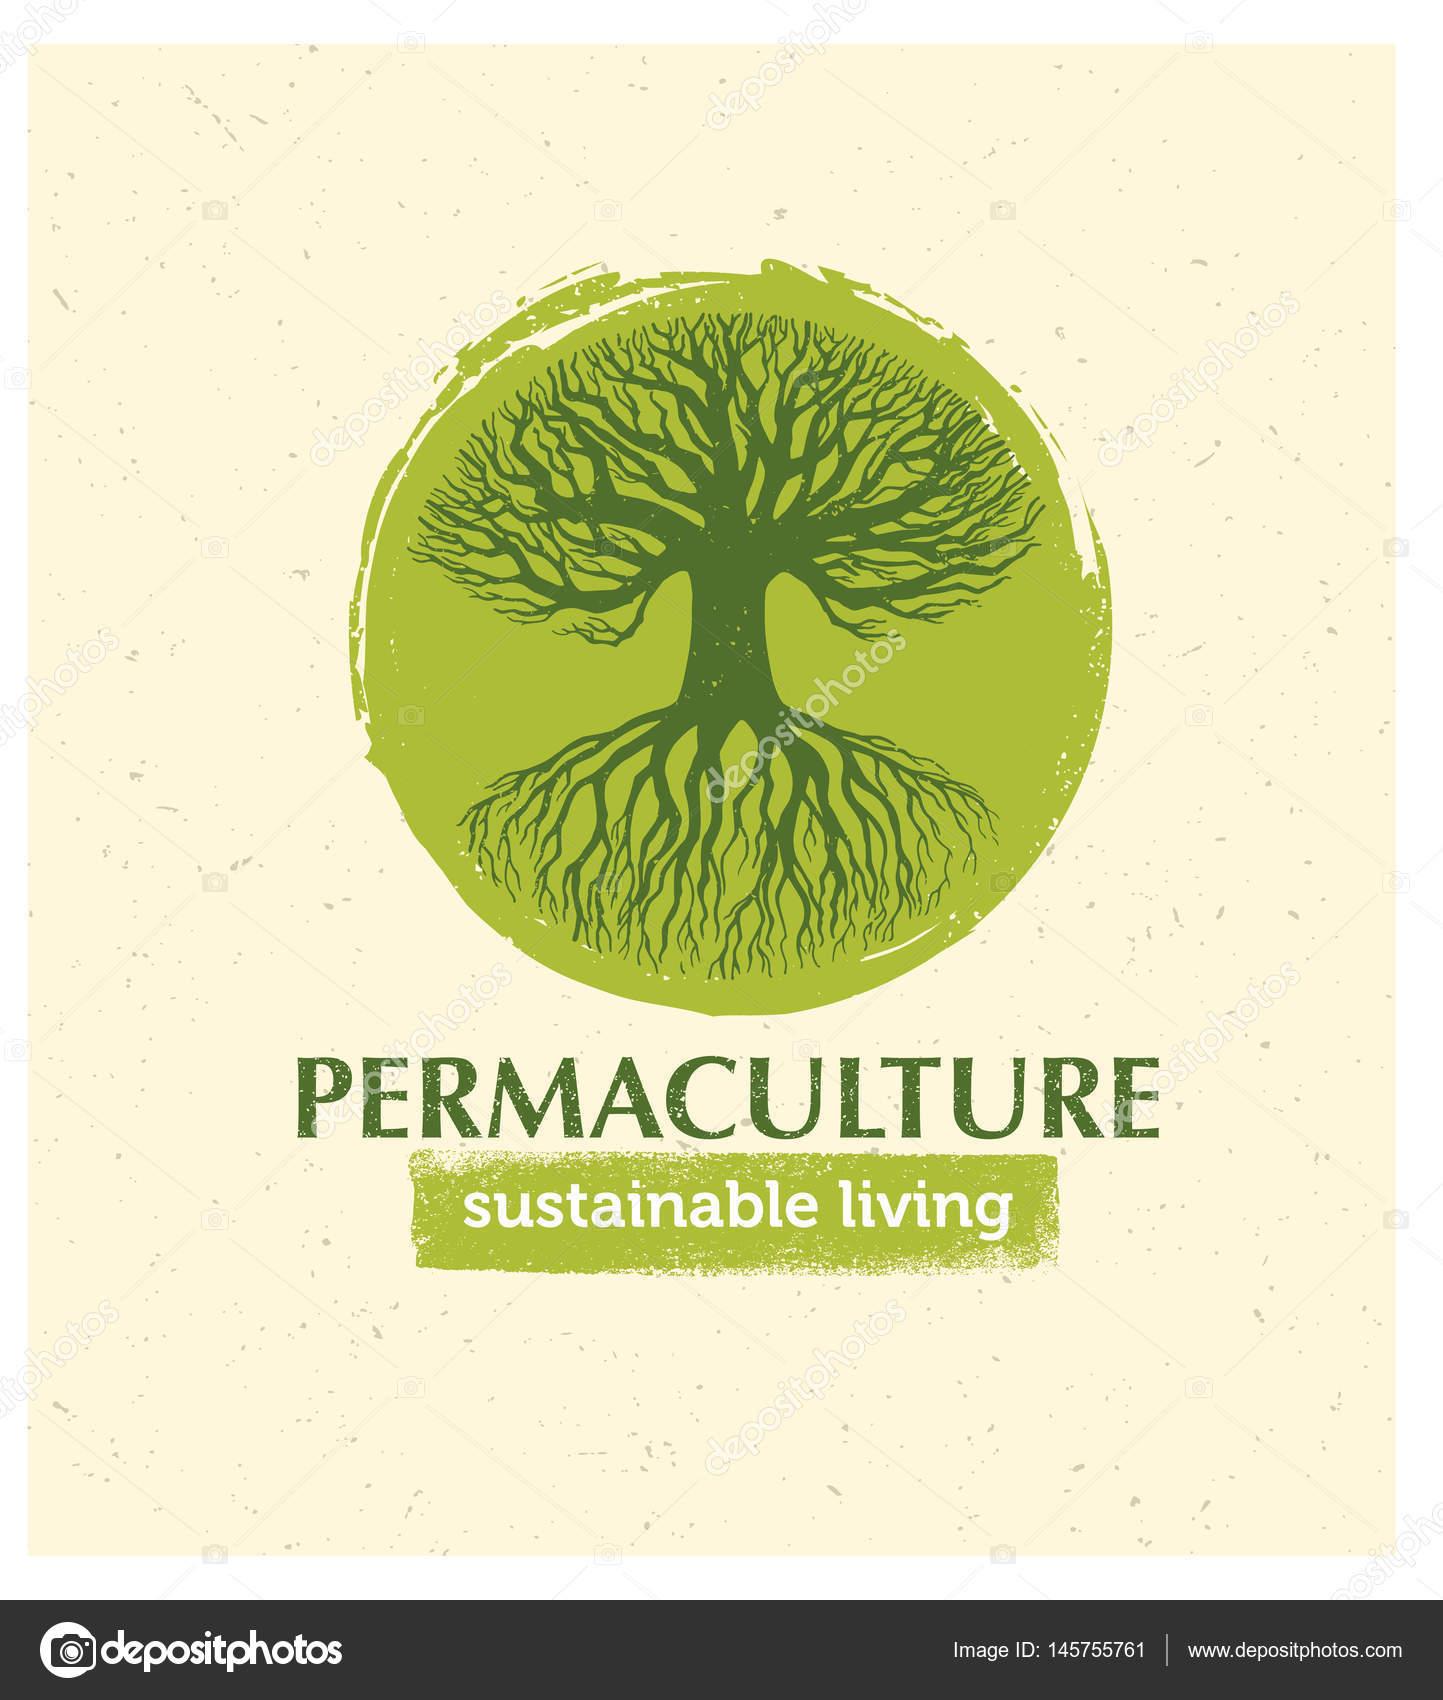 Kreatives Wohndesign: Permakultur Nachhaltige Kreatives Wohndesign